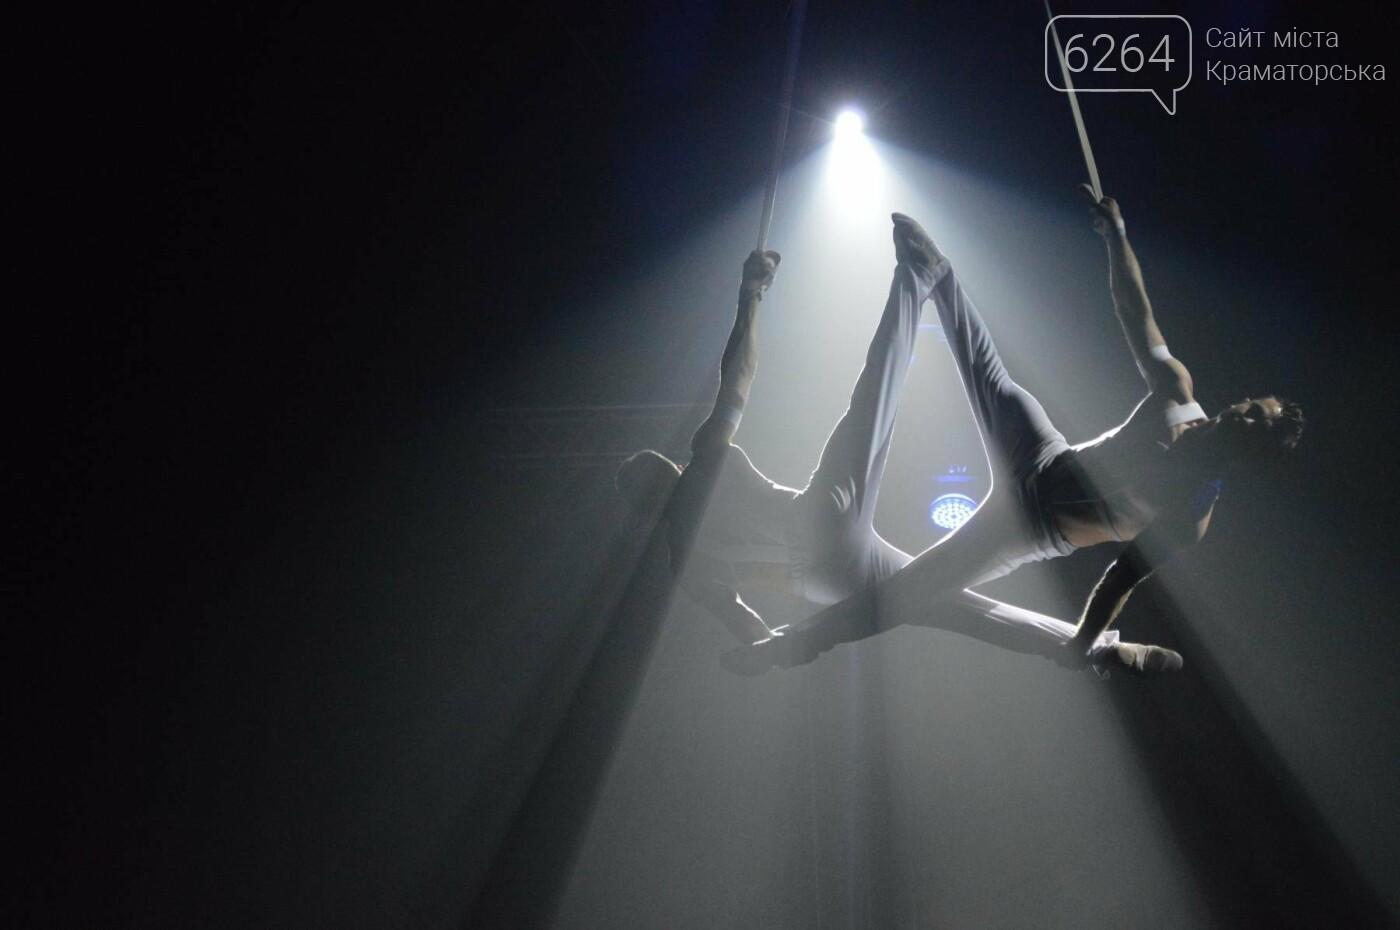 Новое шоу цирка «Кобзов» произвело фурор в Краматорске, фото-4